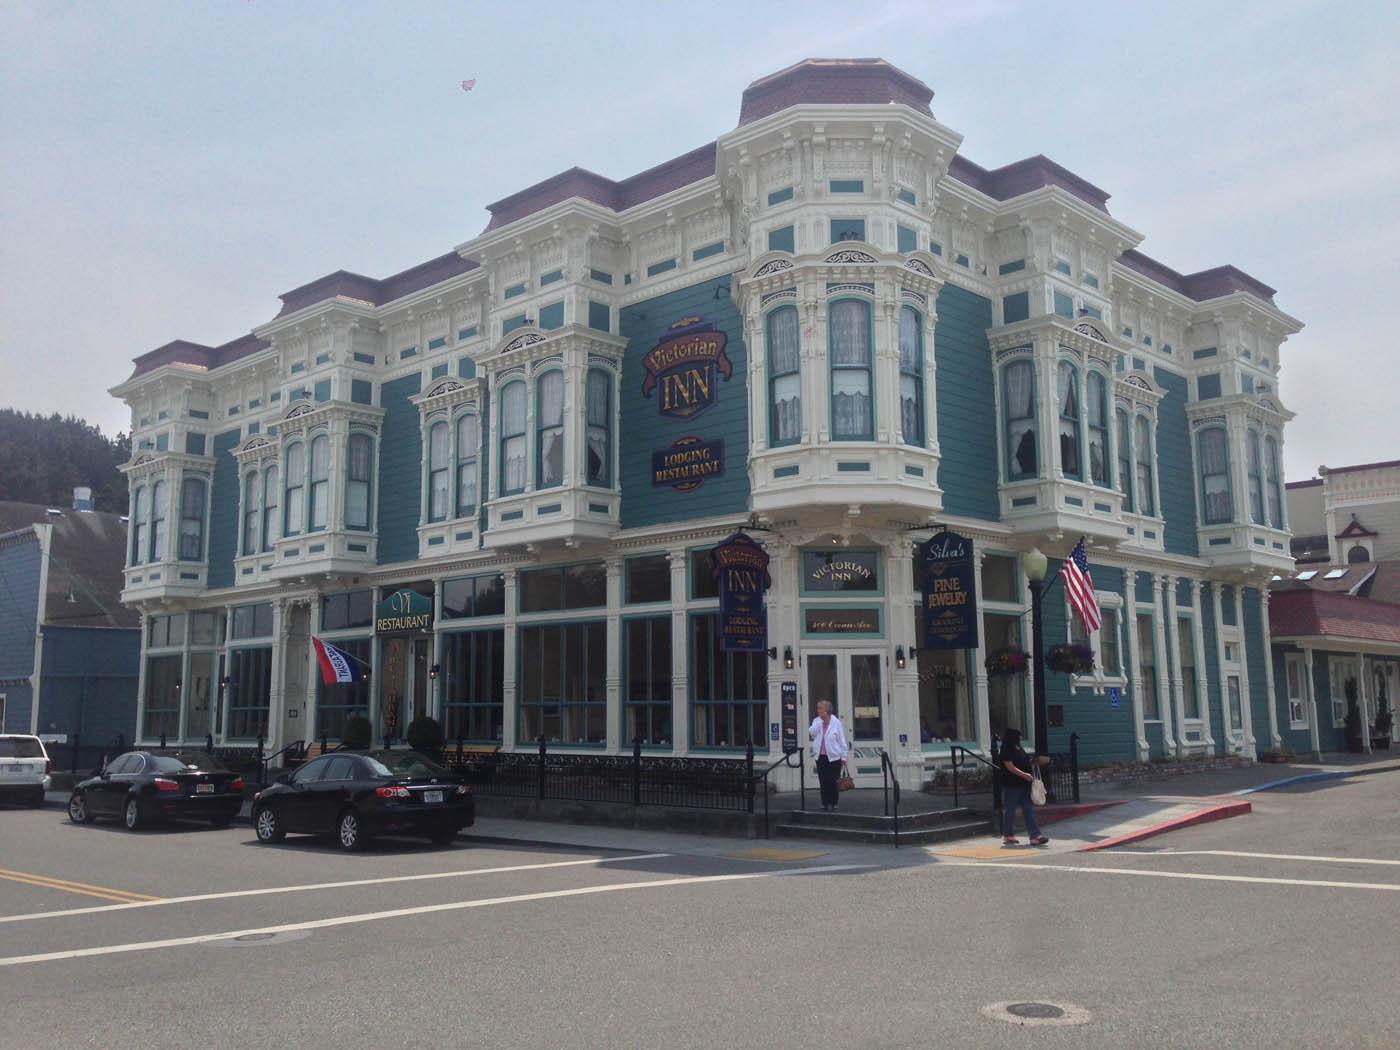 Victorian InnS